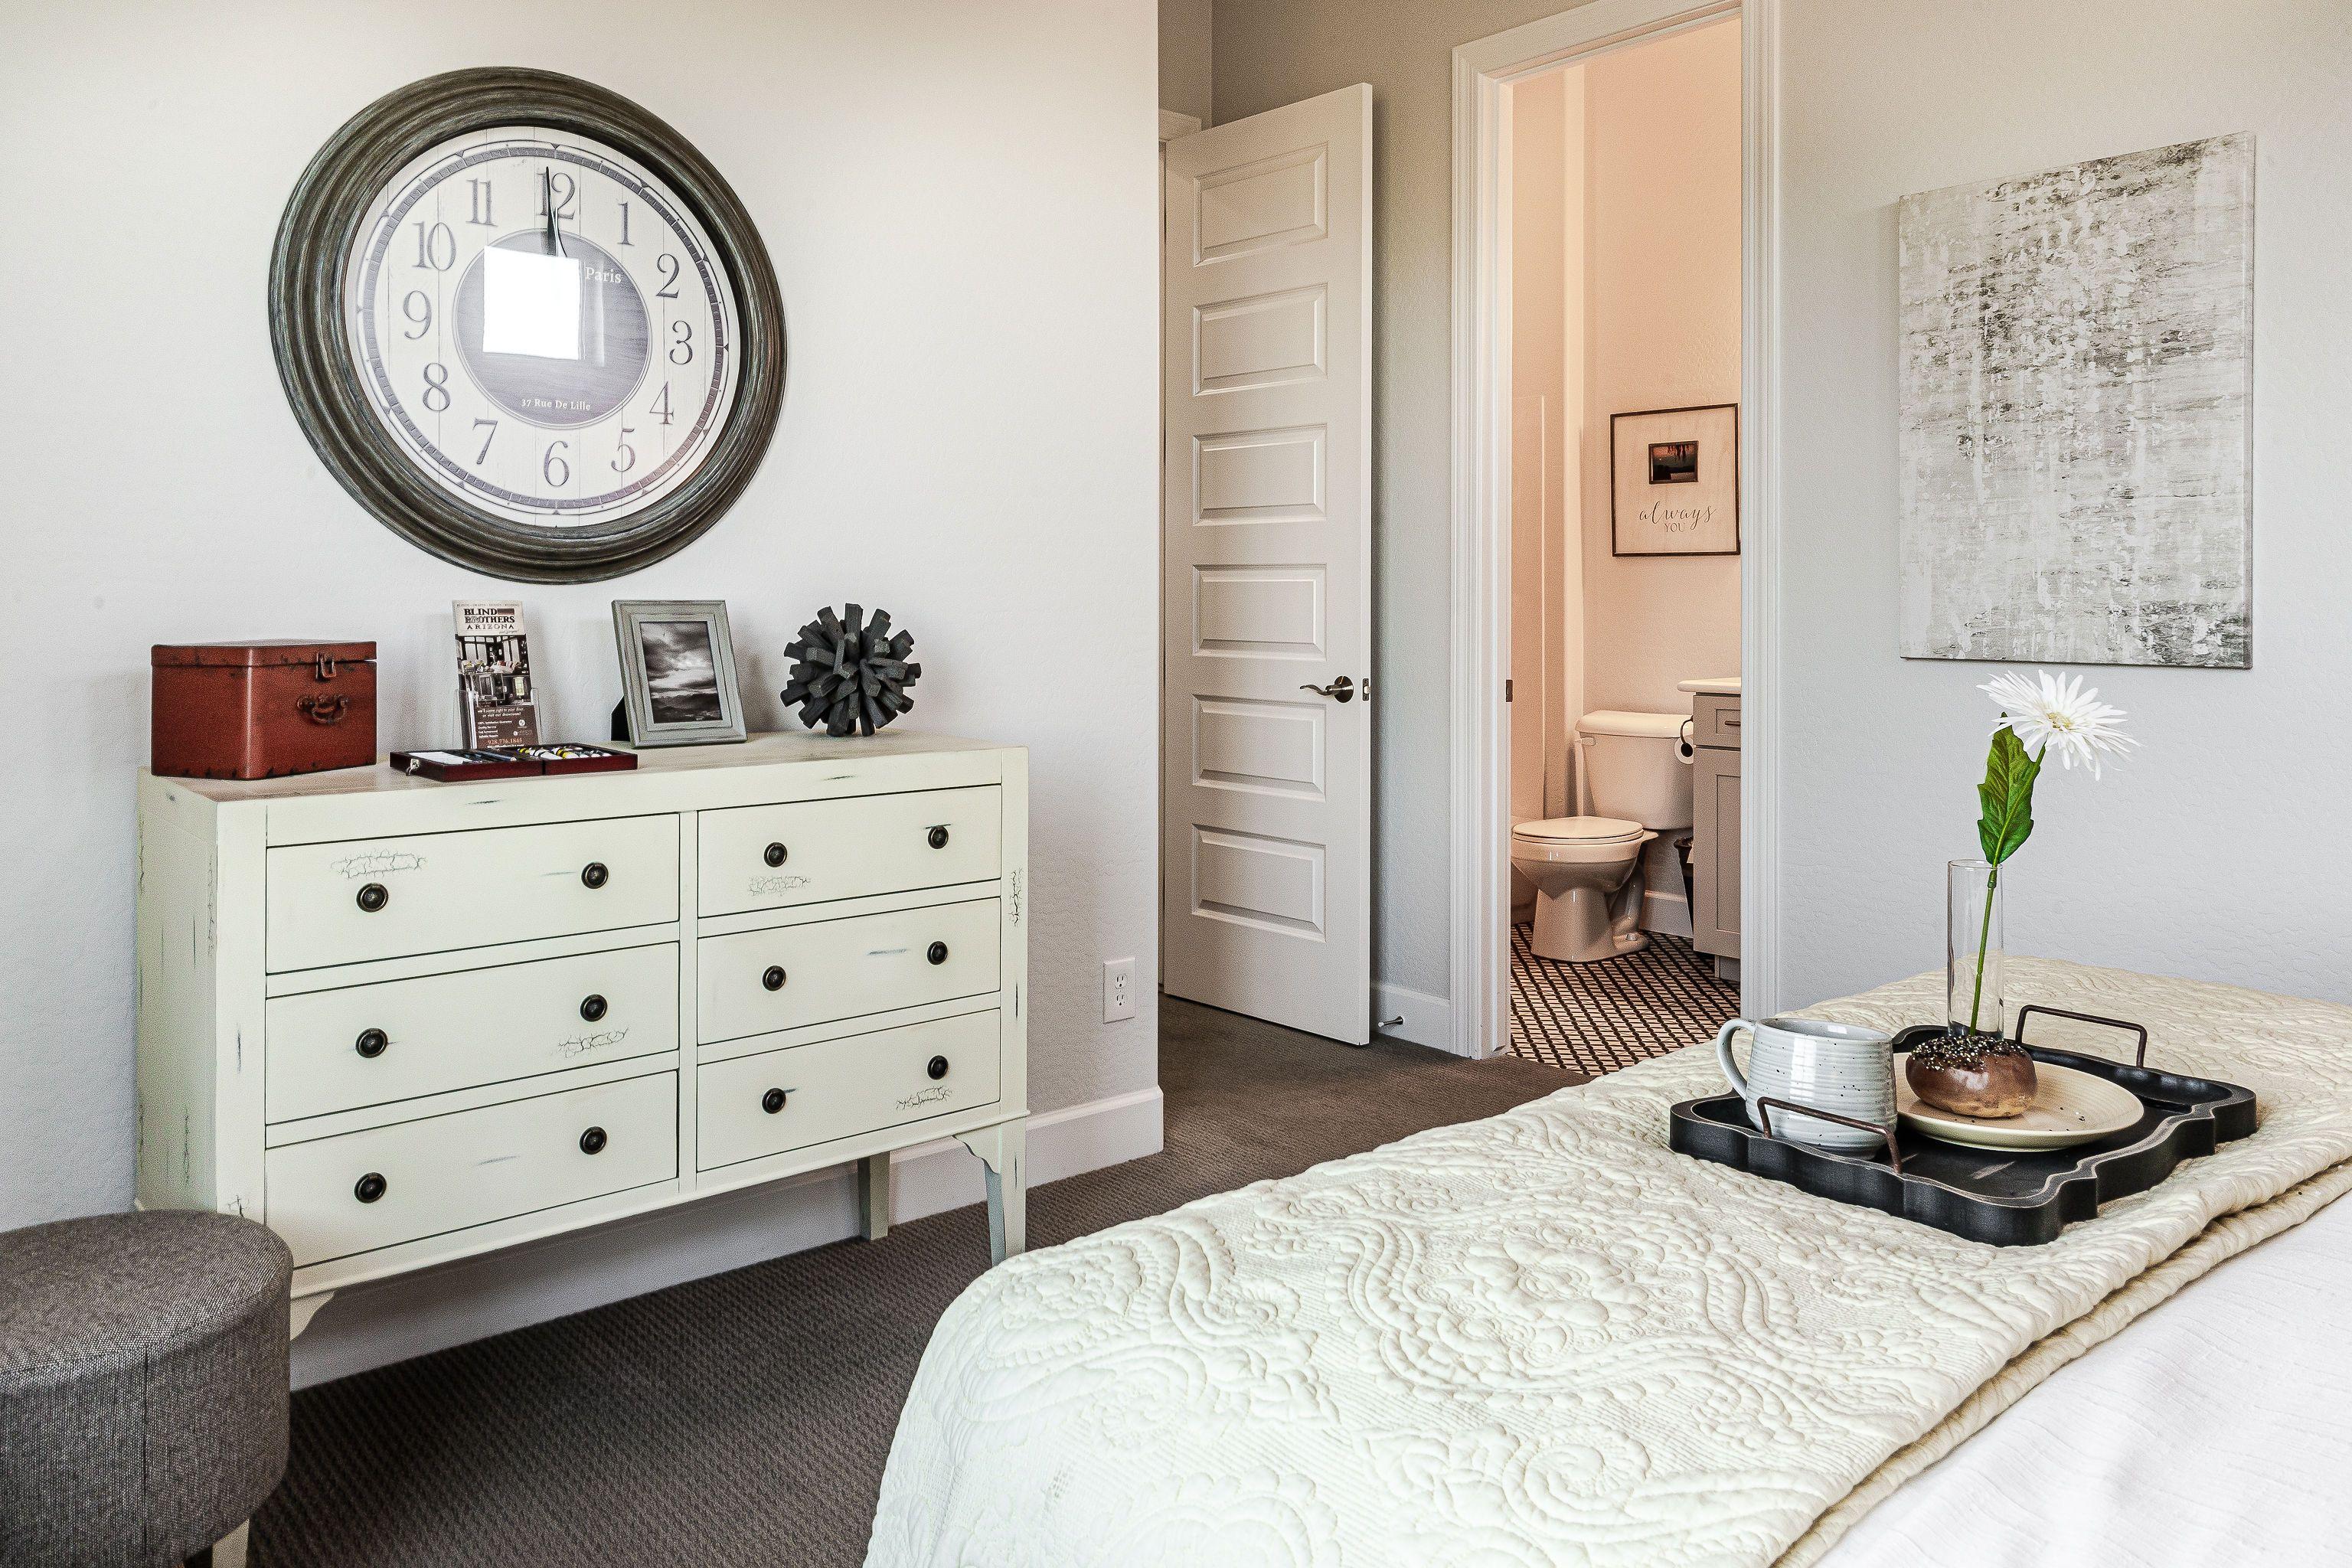 Bedroom featured in the Keystone By Dorn Homes  in Prescott, AZ